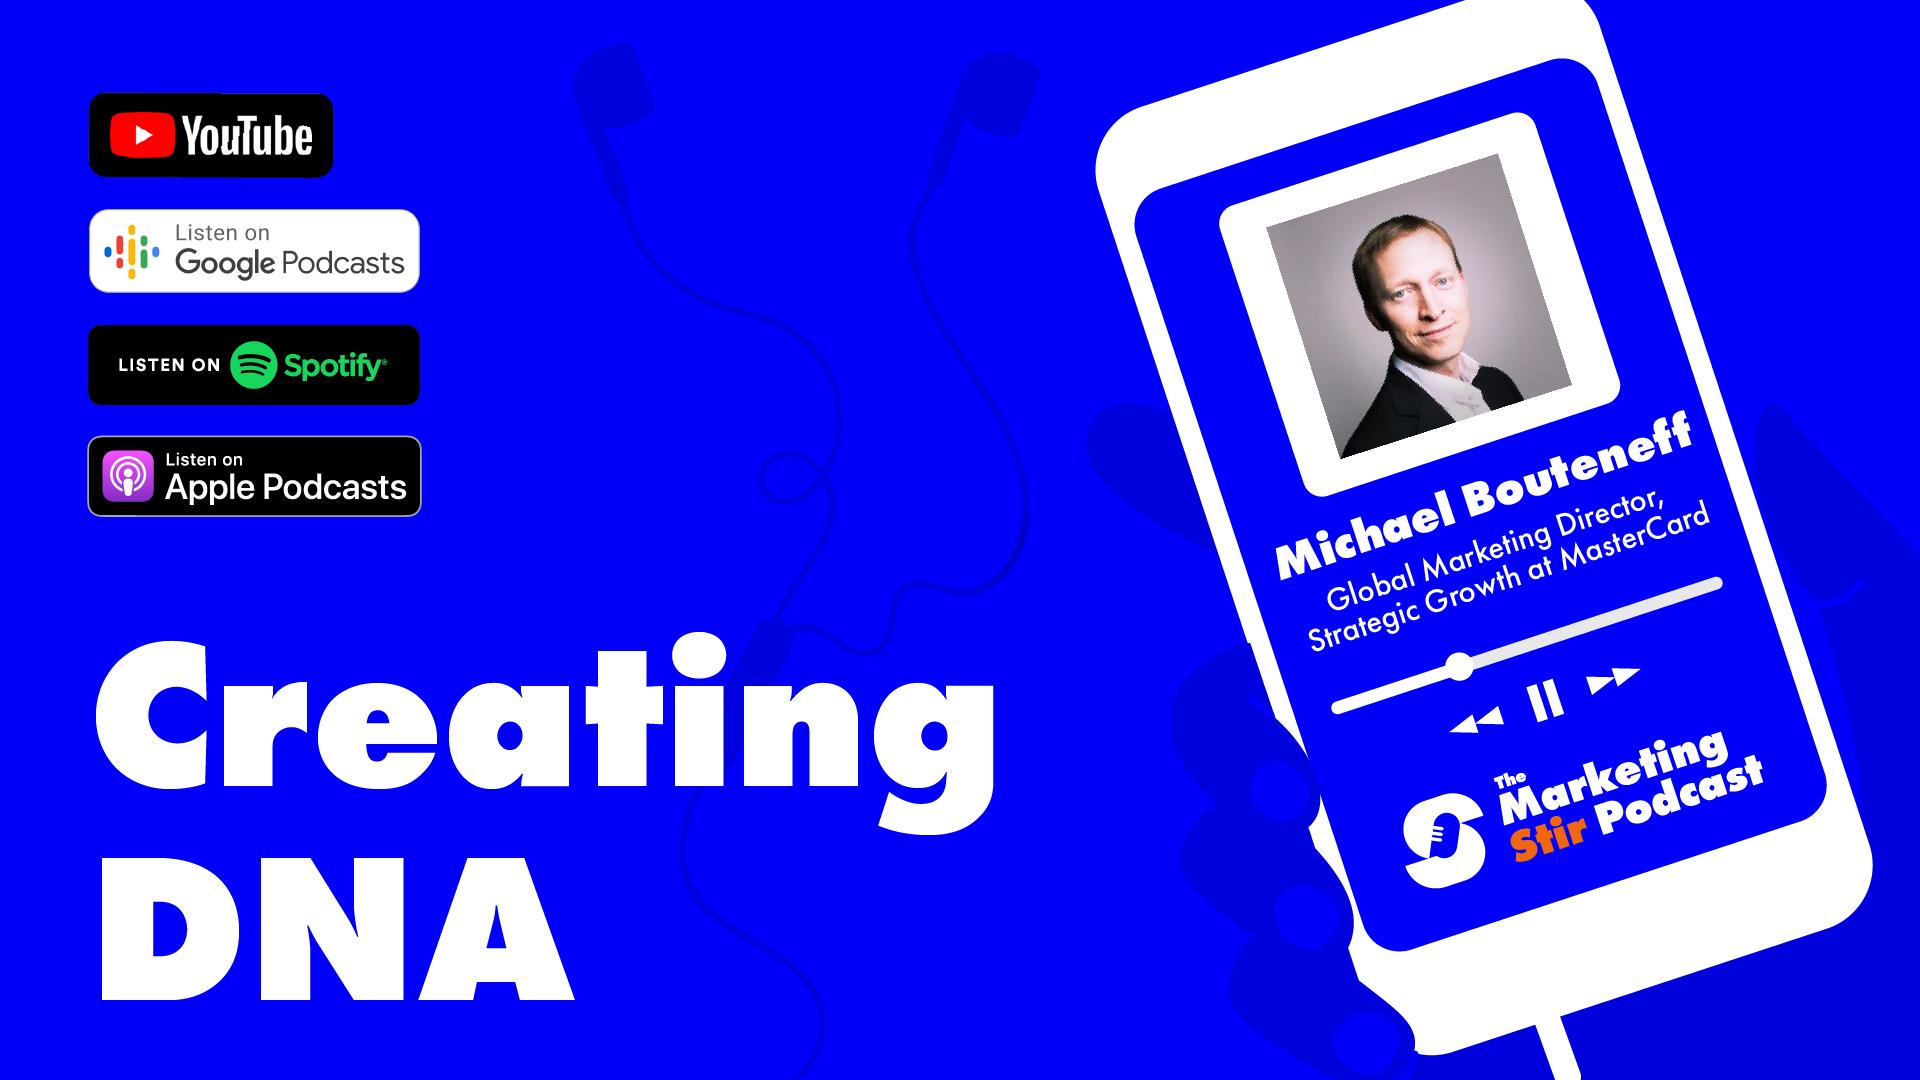 Michael Bouteneff (Mastercard) - Creating DNA